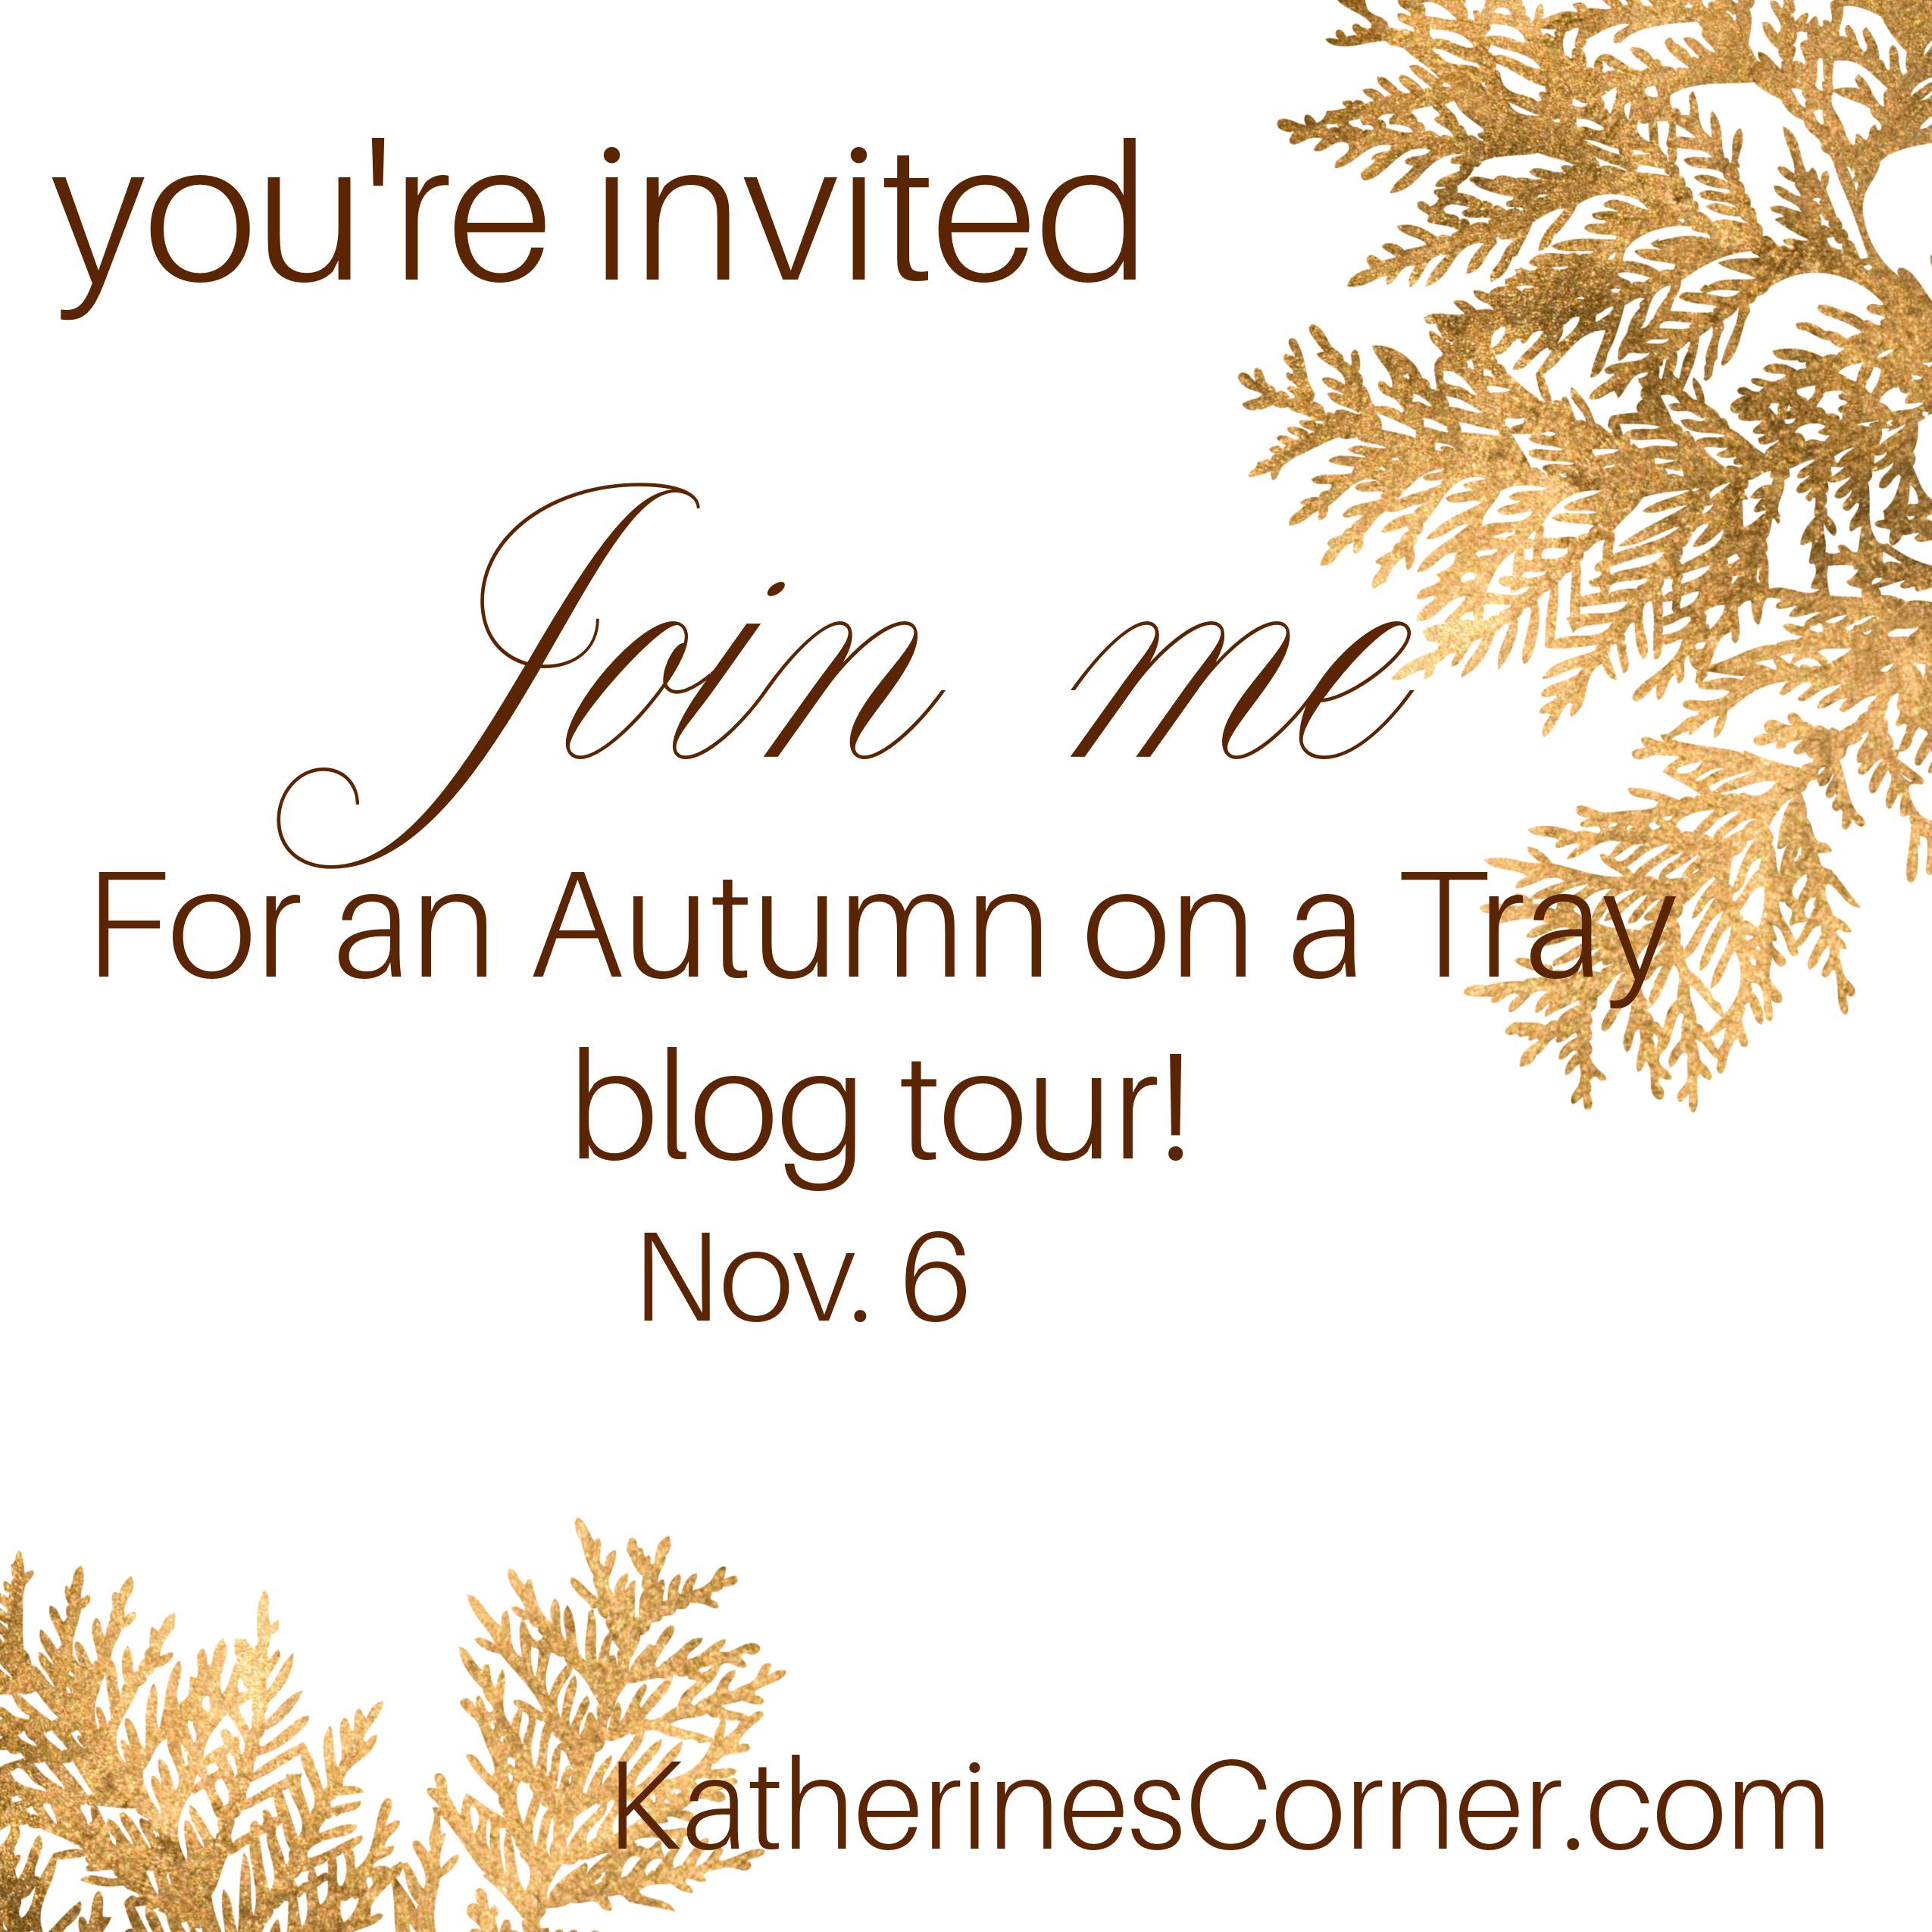 Autumn Tray Blog Tour Invitation